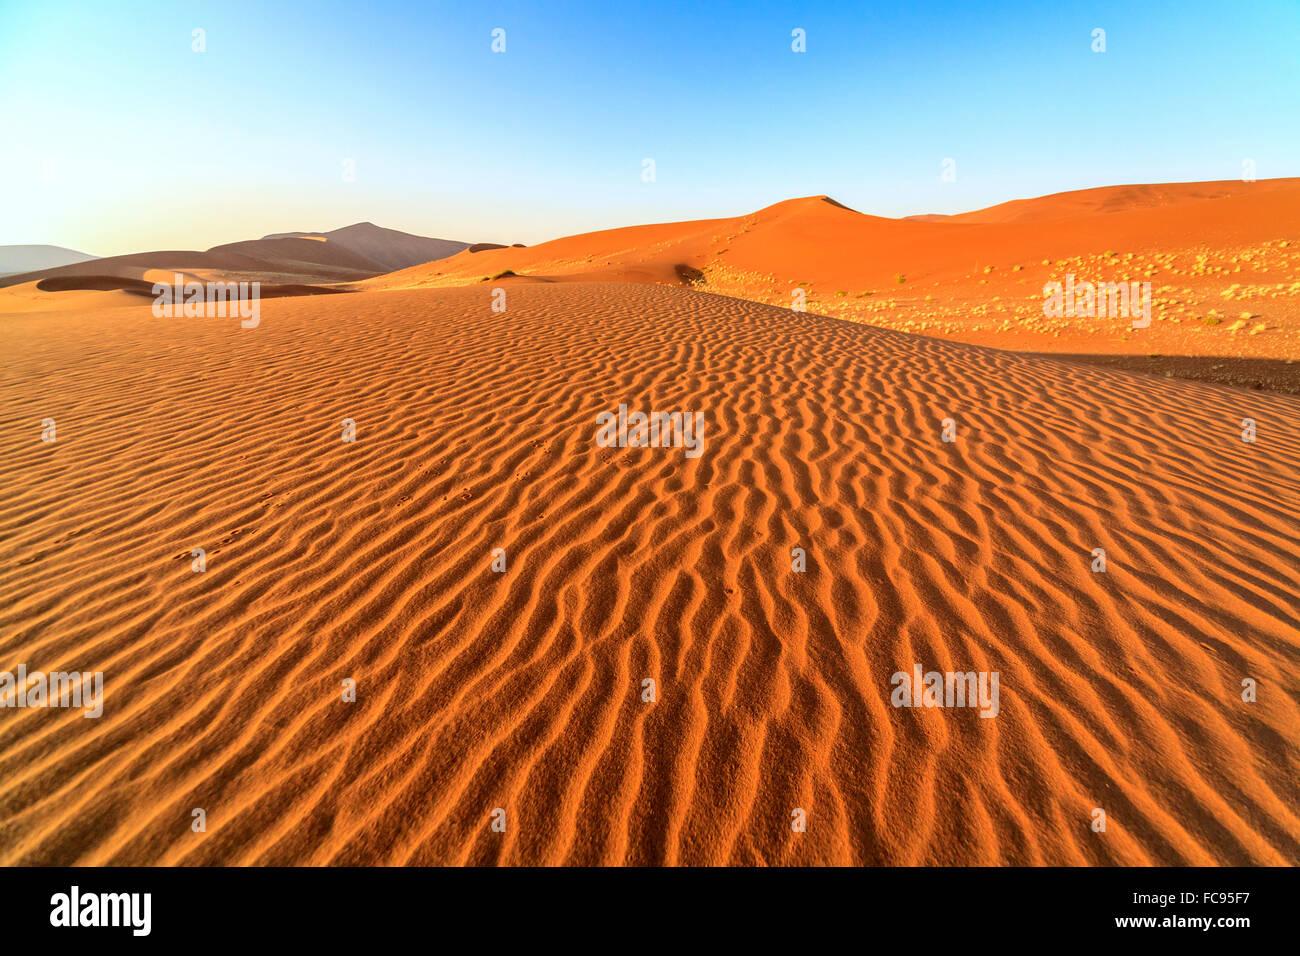 Dried plants among the sand dunes shaped by wind, Deadvlei, Sossusvlei, Namib Desert, Namib Naukluft National Park, - Stock Image